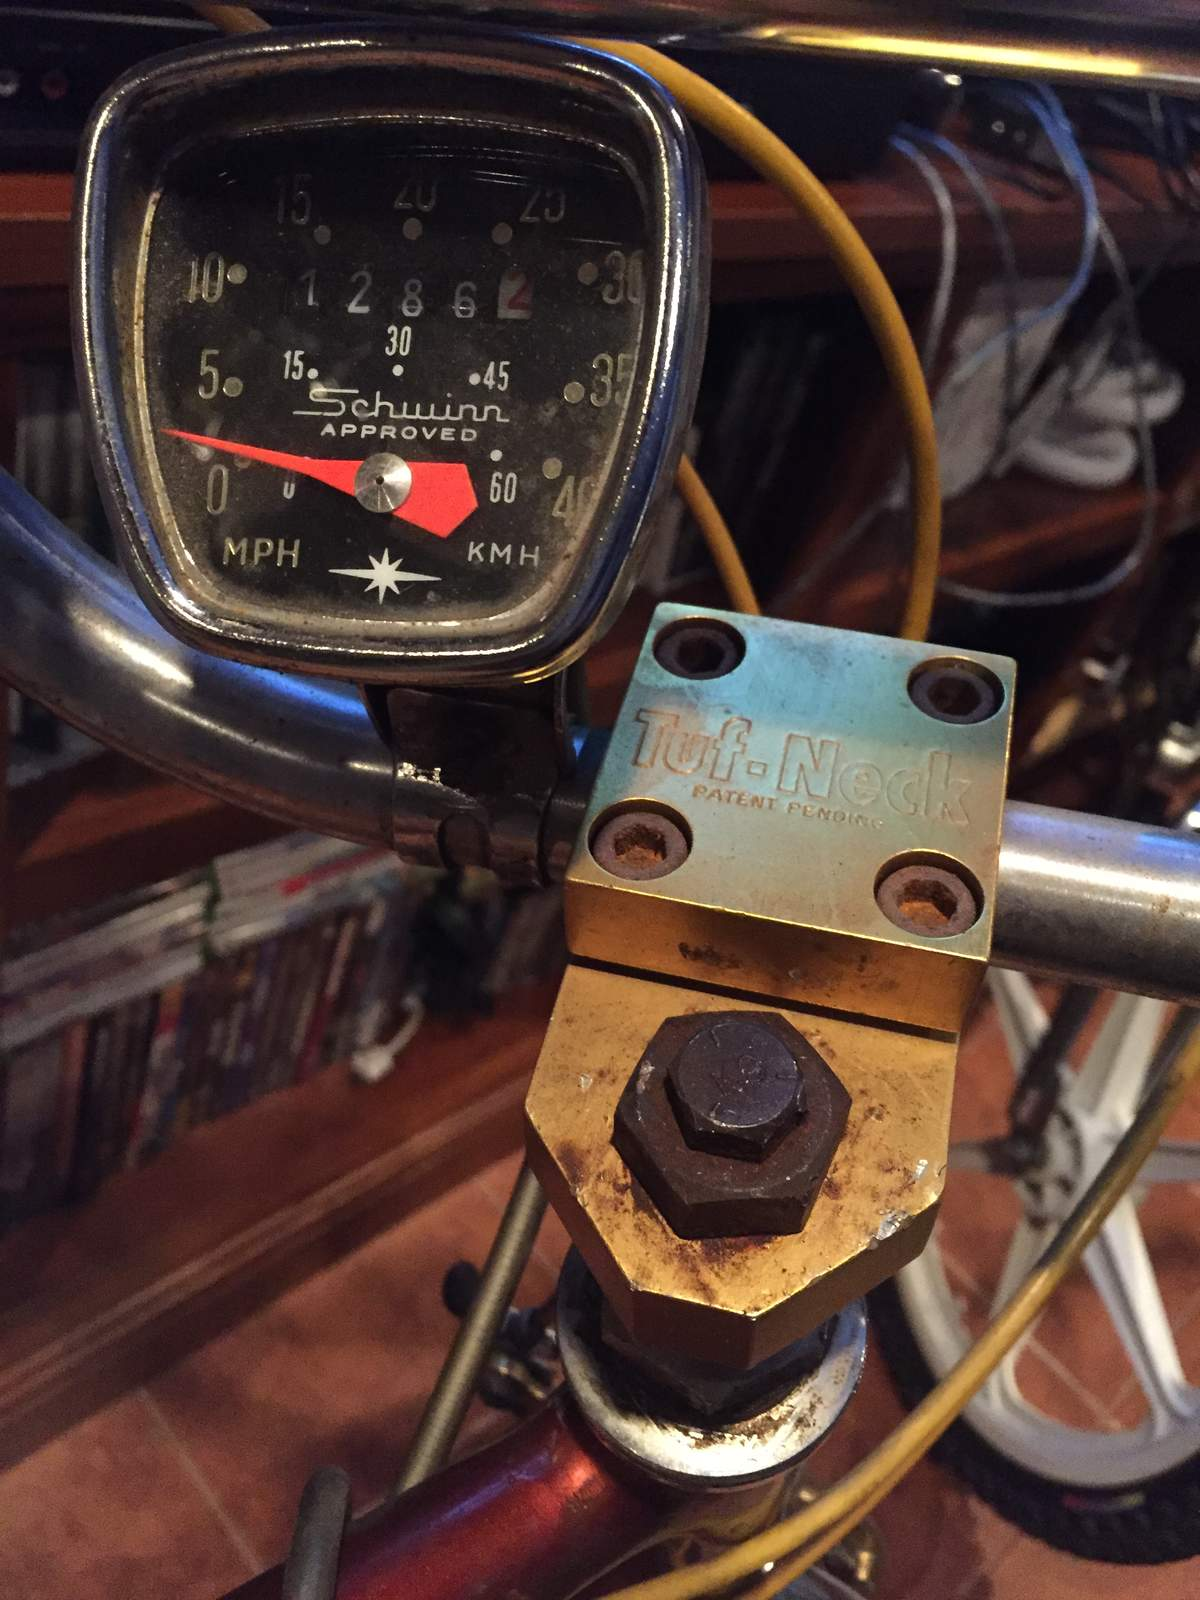 http://uploads.bmxmuseum.com/user-images/45011/img_523059bf588625.jpg